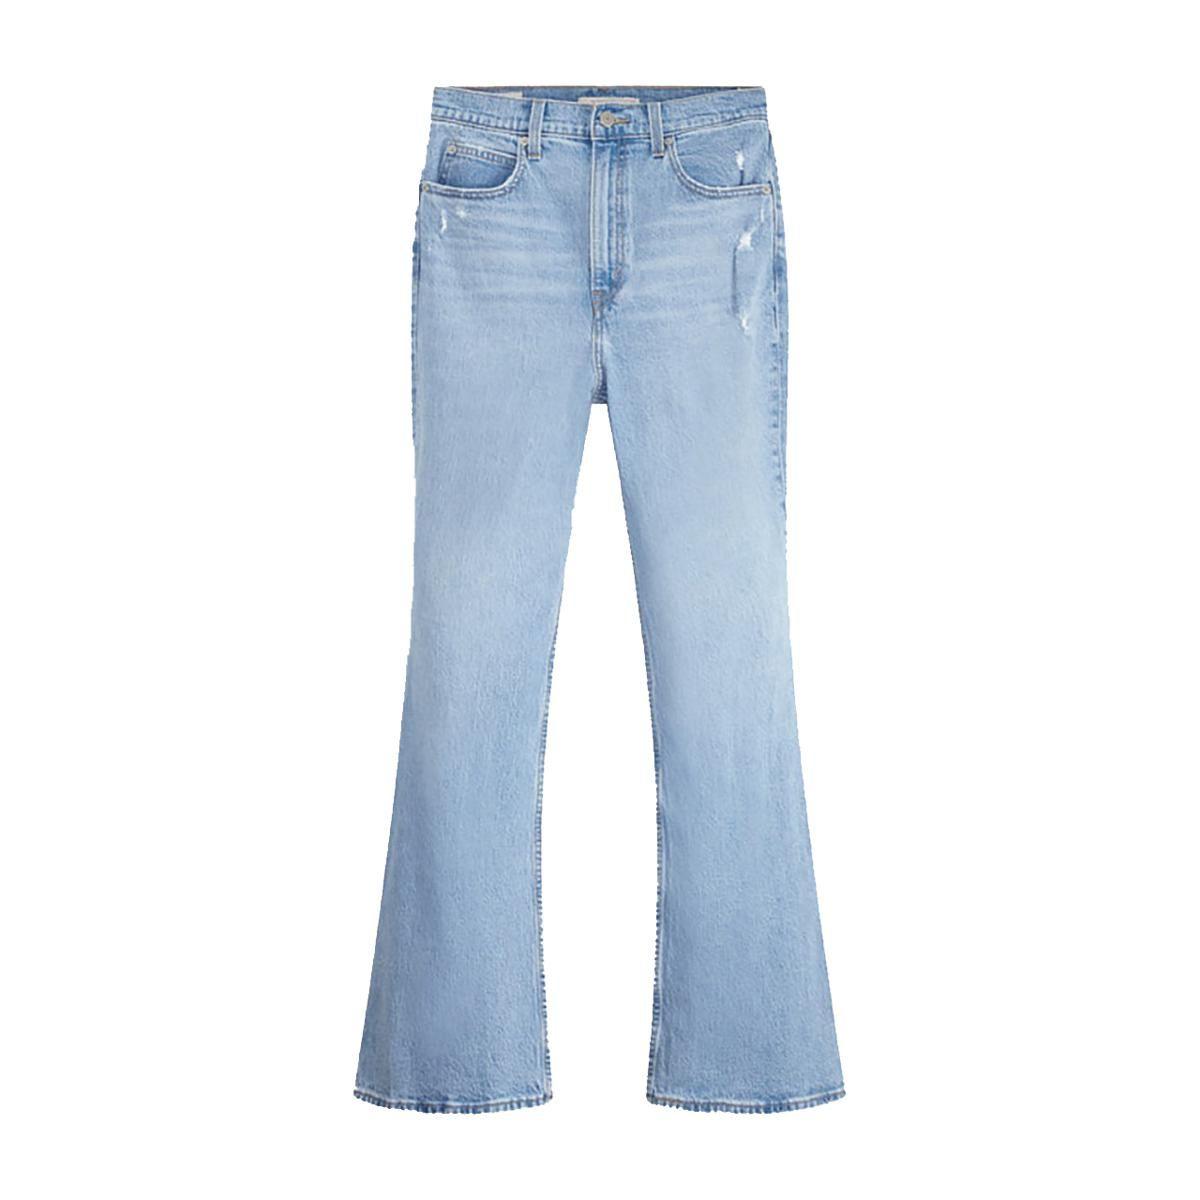 levis 70s high rise jeans